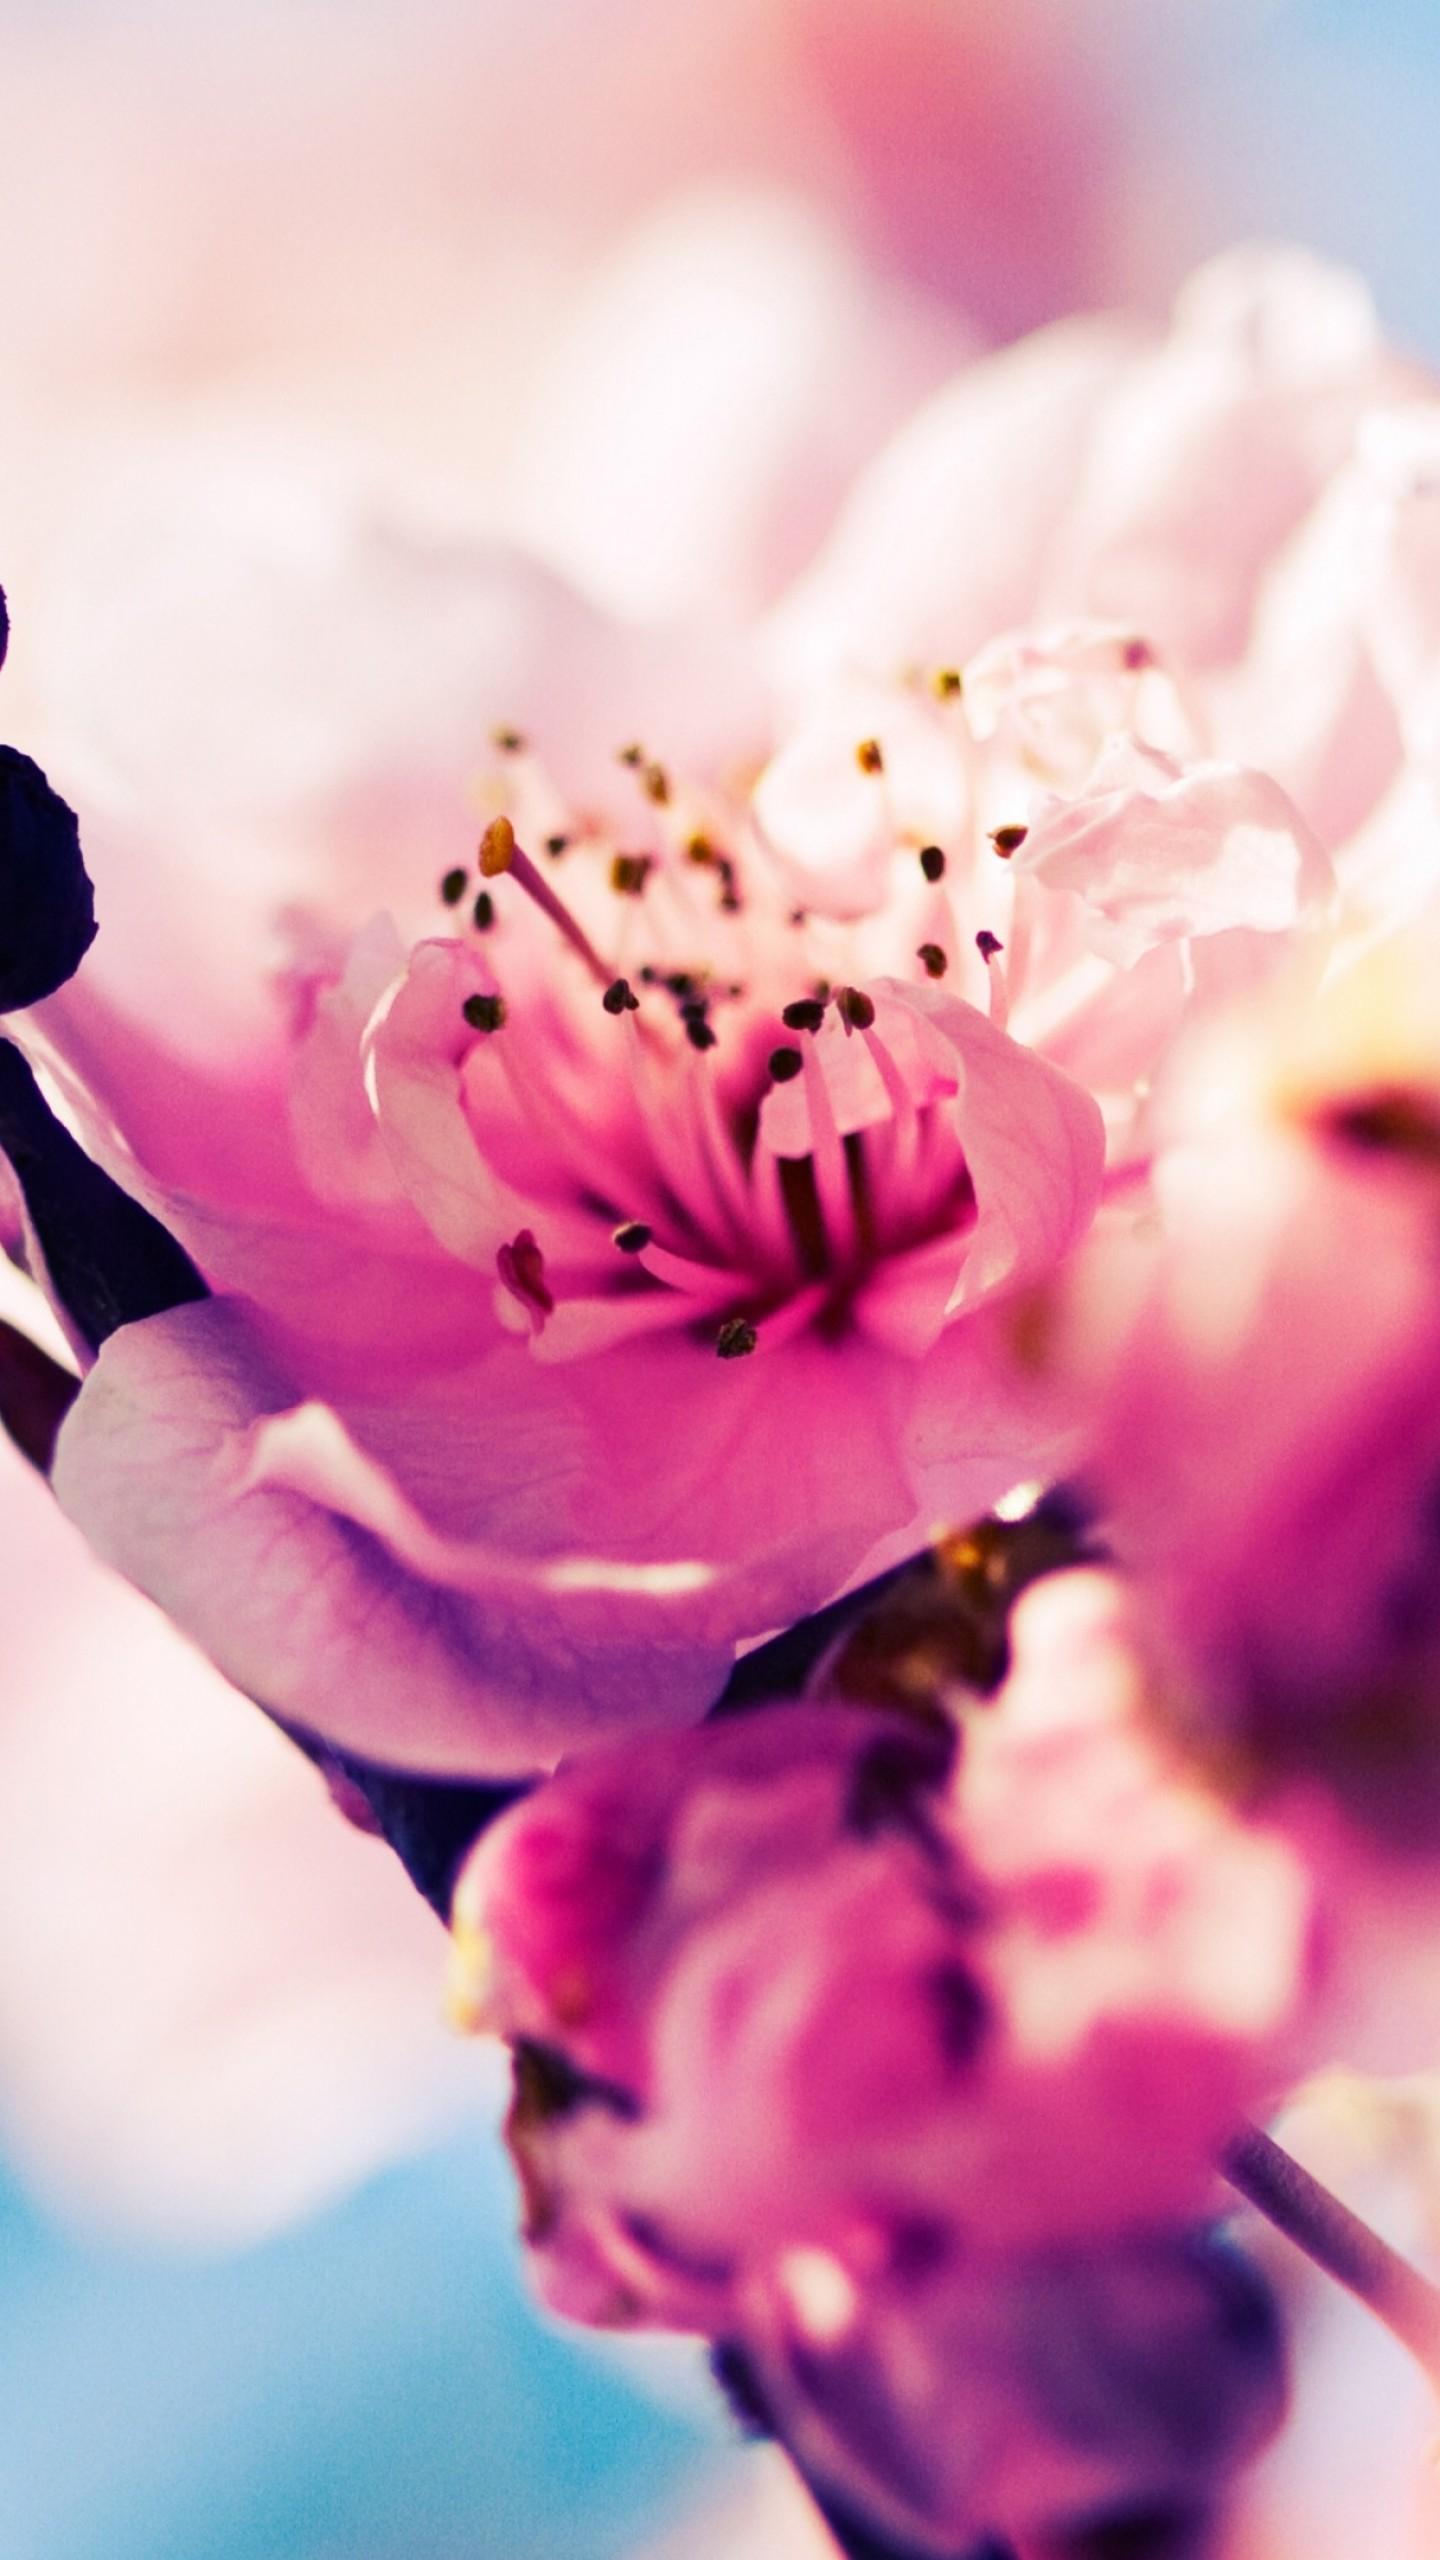 Wallpaper cherry 4k 5k wallpaper blossom branch - Pink wallpaper 4k ...